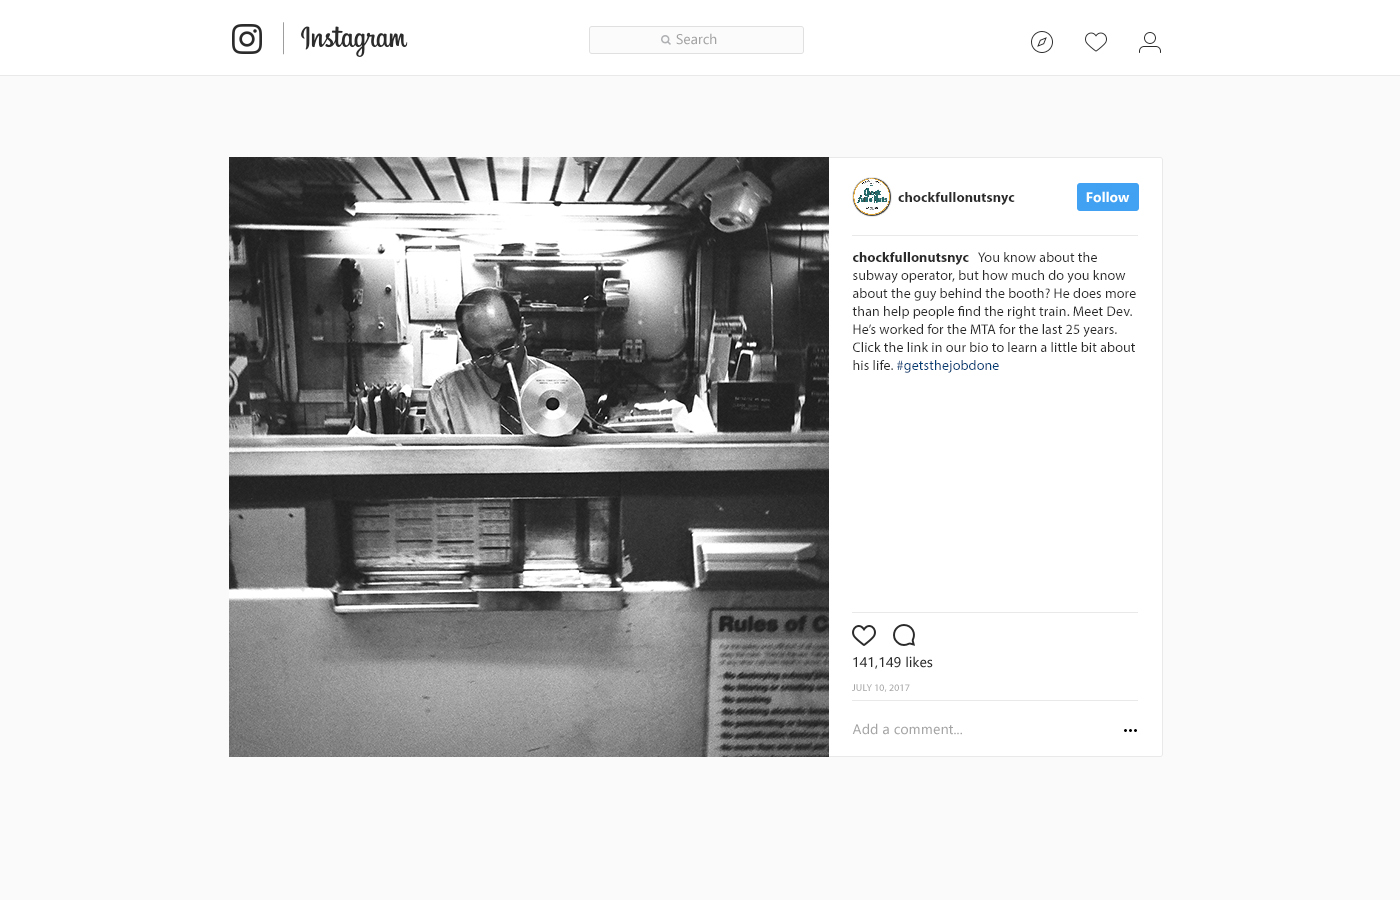 subway operator chock full o nuts instagram-VIDEO post-2017-win (1).jpg